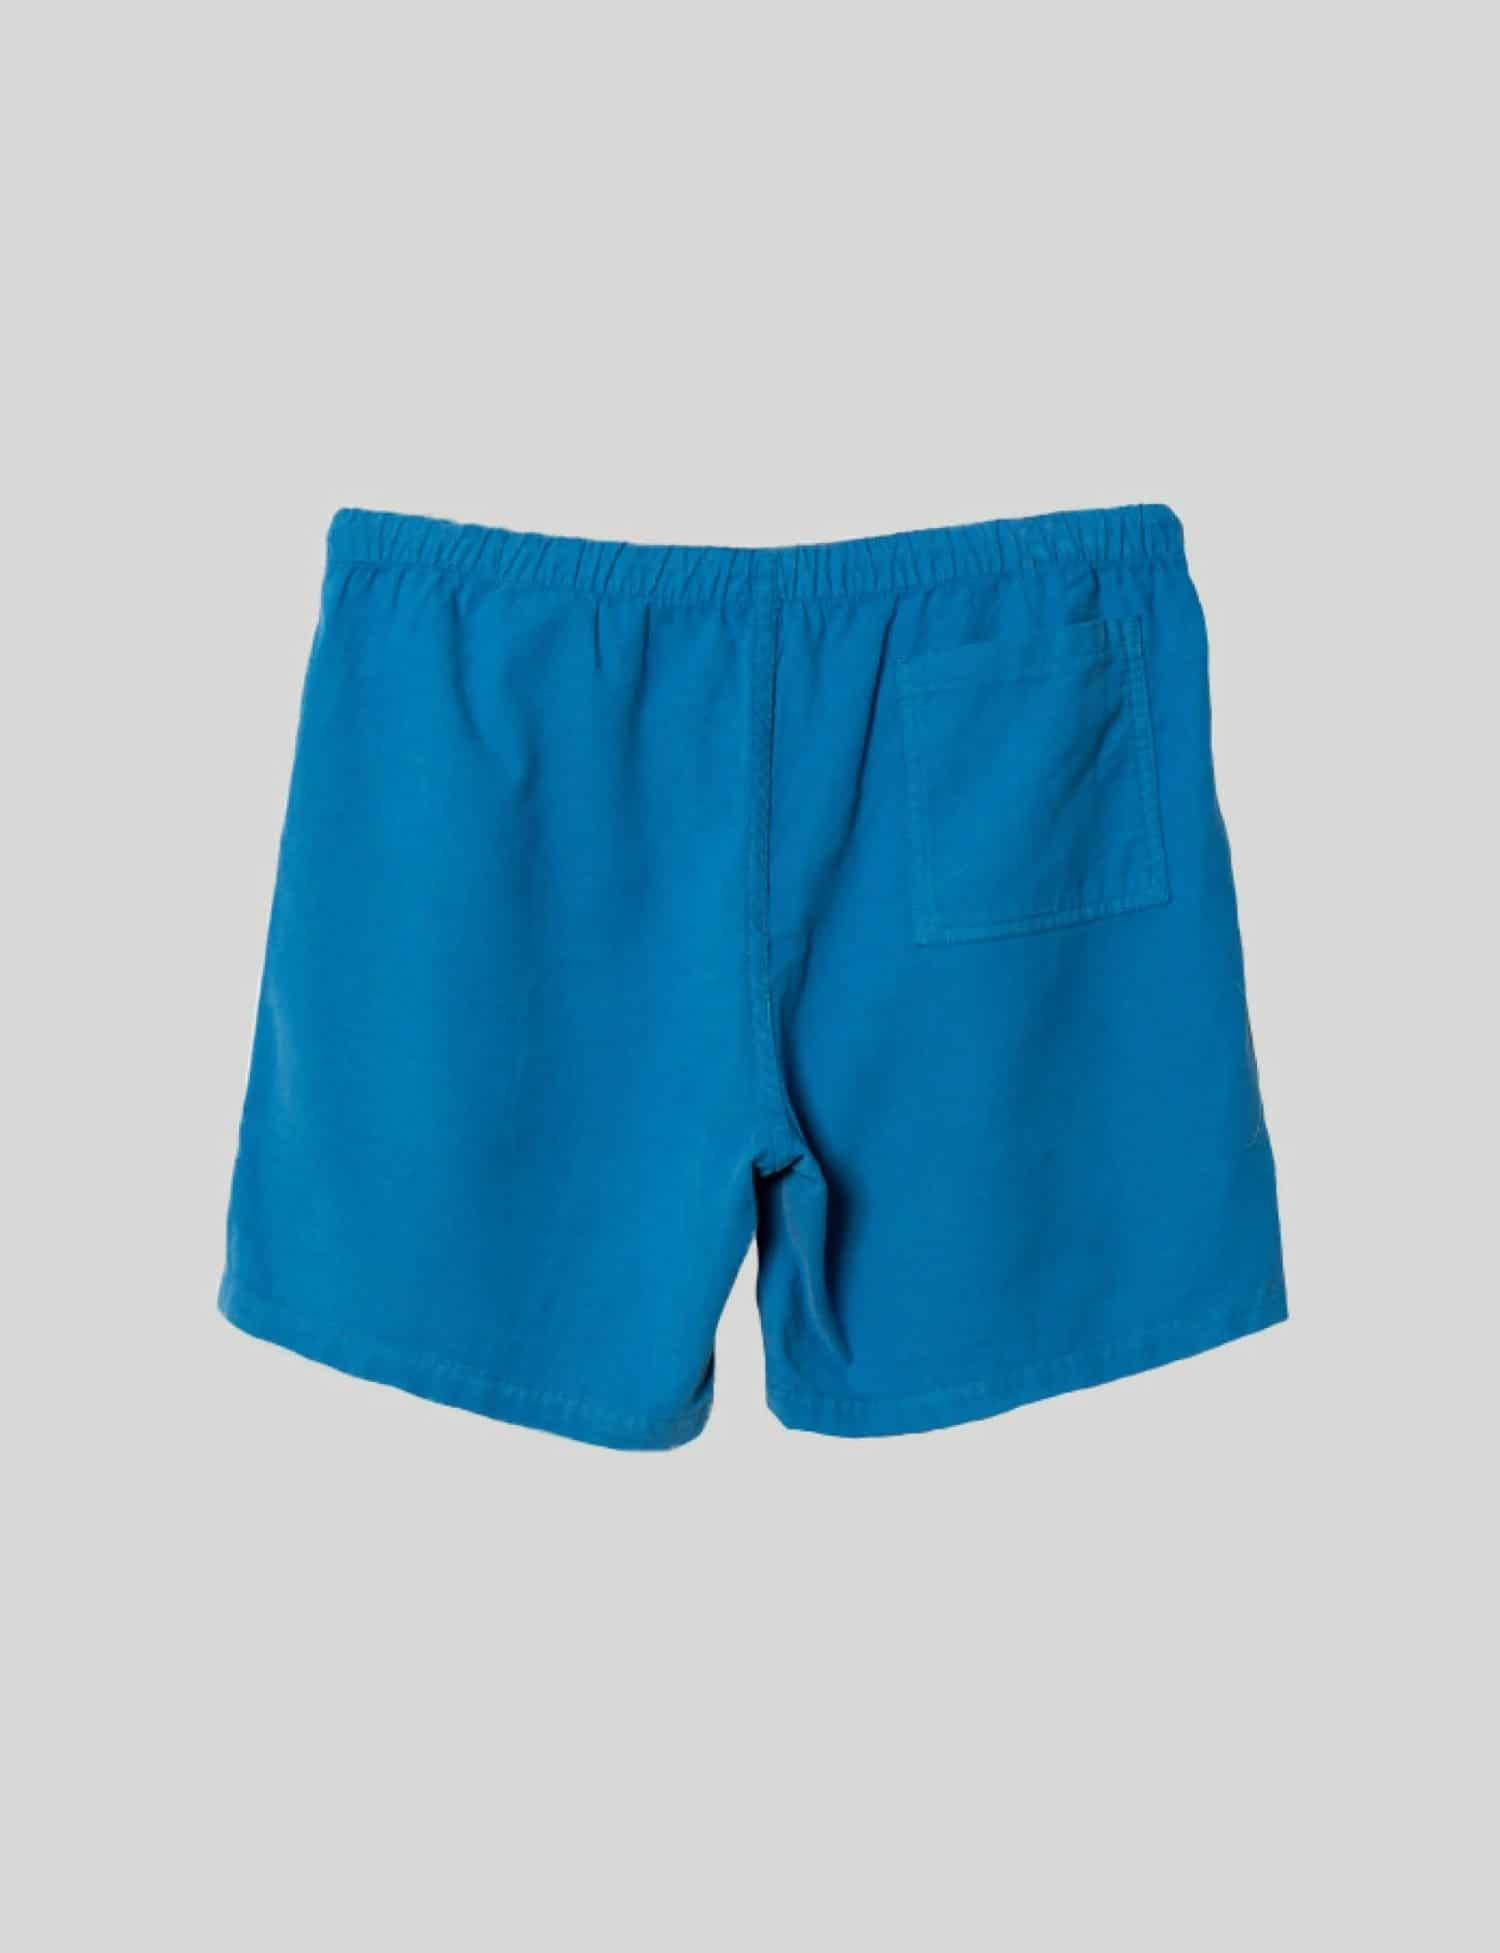 Castart - La Paz - Formigal Shorts - French Blue